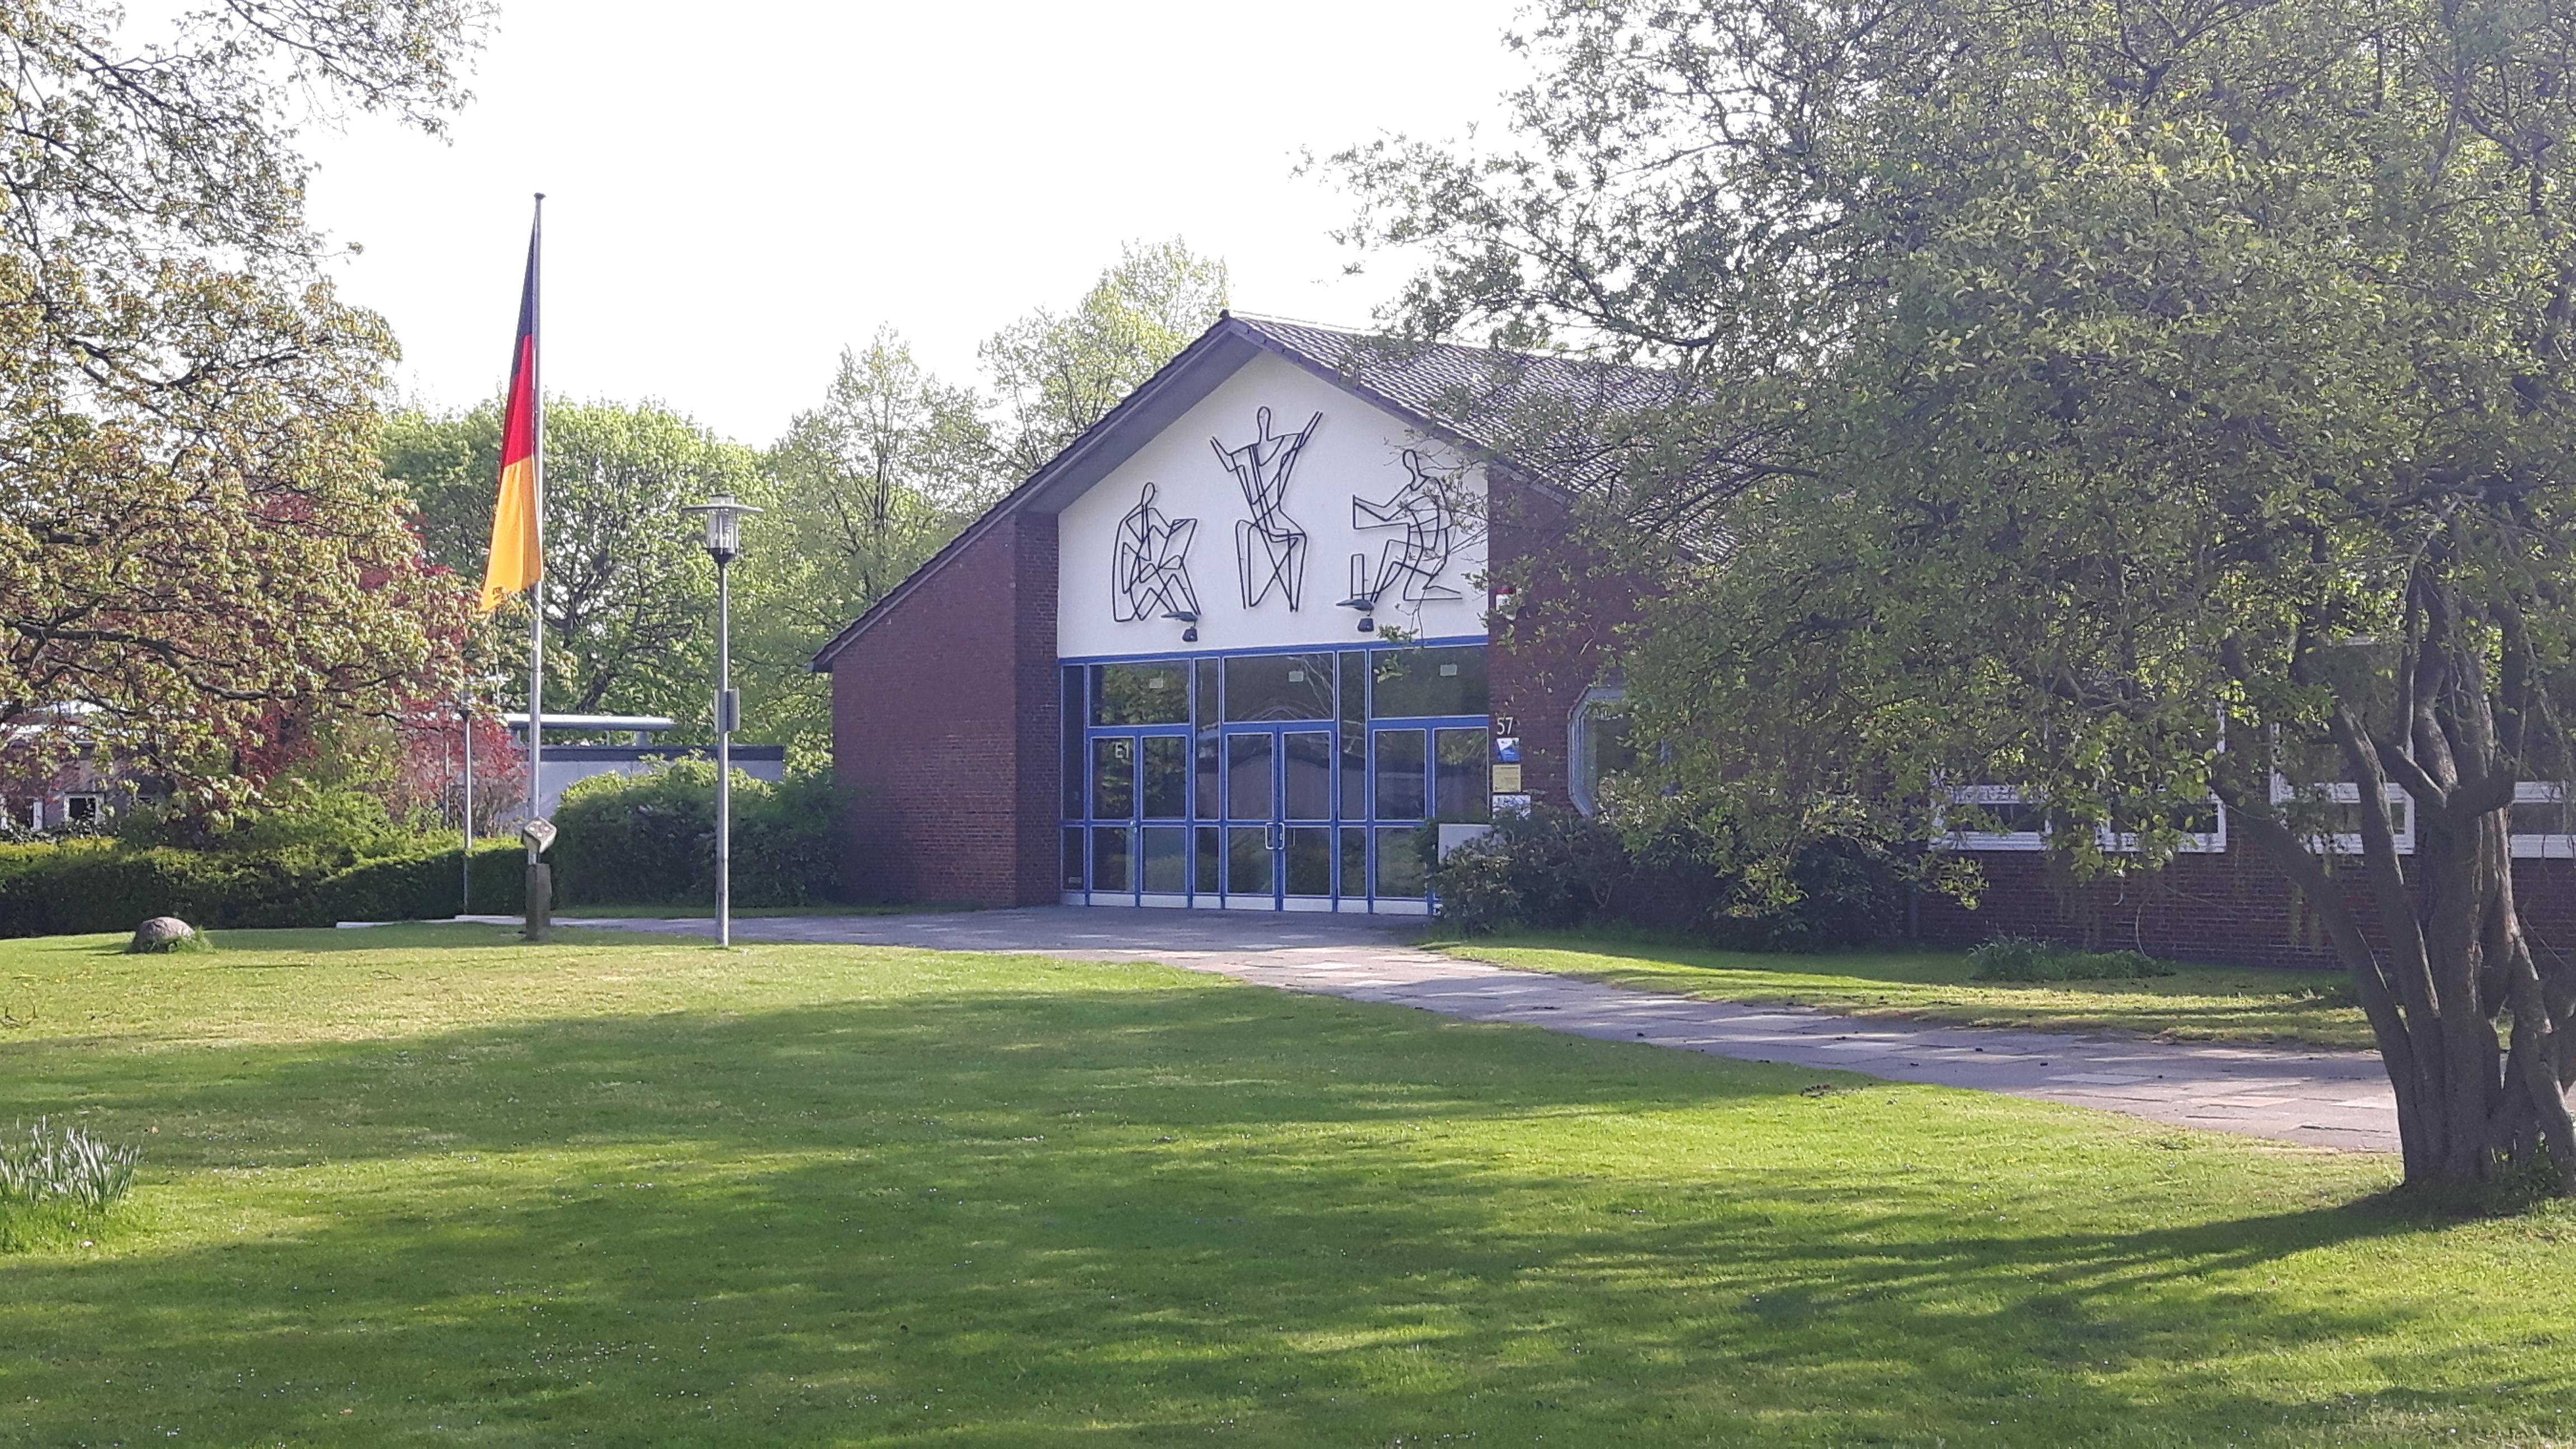 Gymnasium Neue Oberschule – Wikipedia